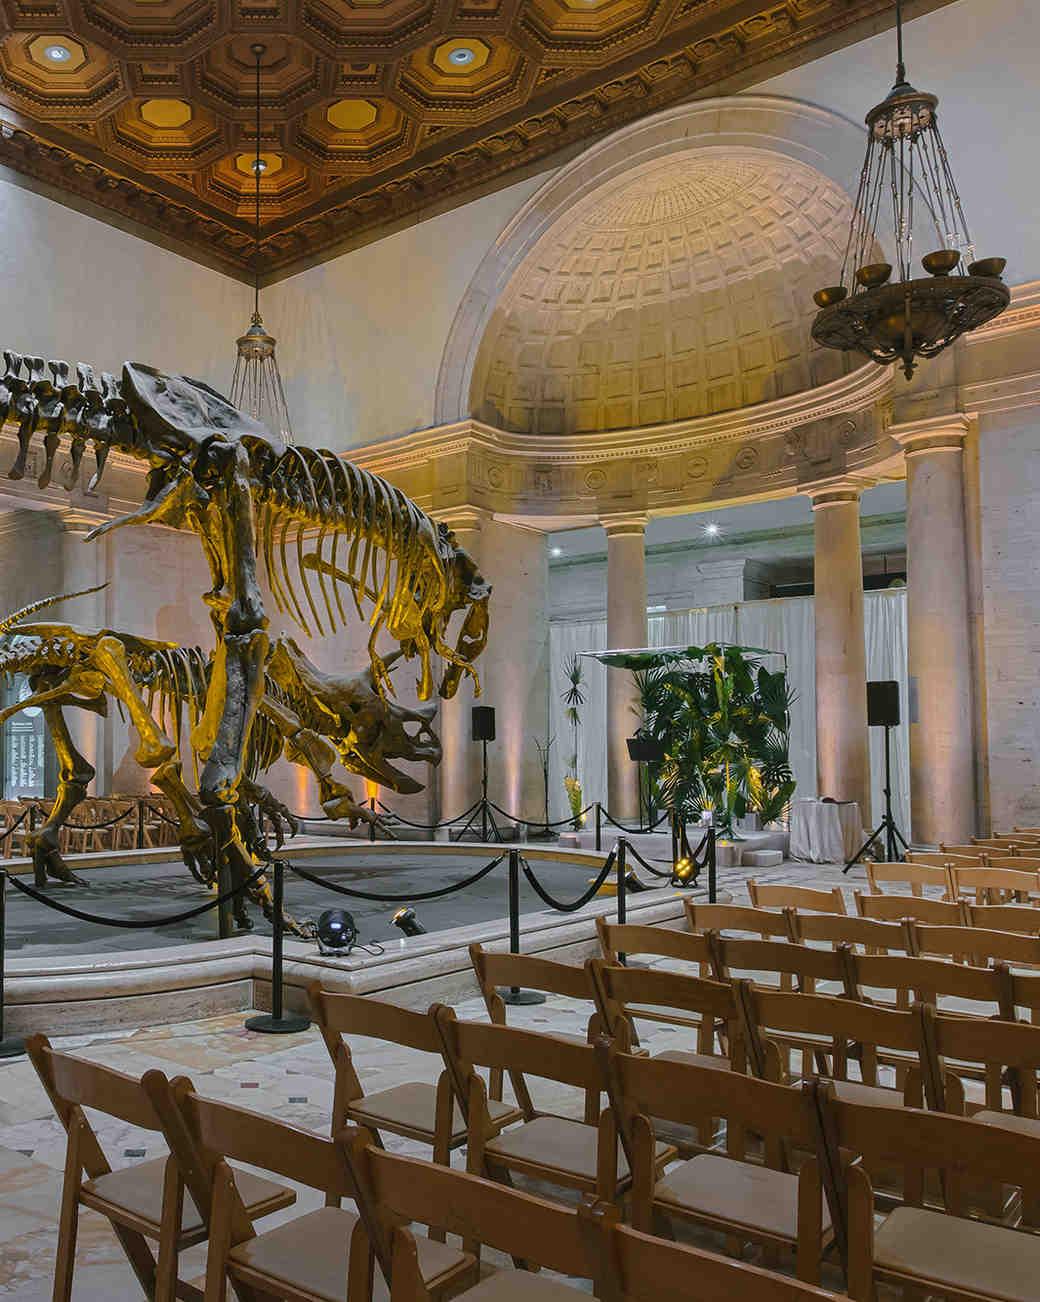 duff goldman johnna colbry ceremony venue dinosaur museum